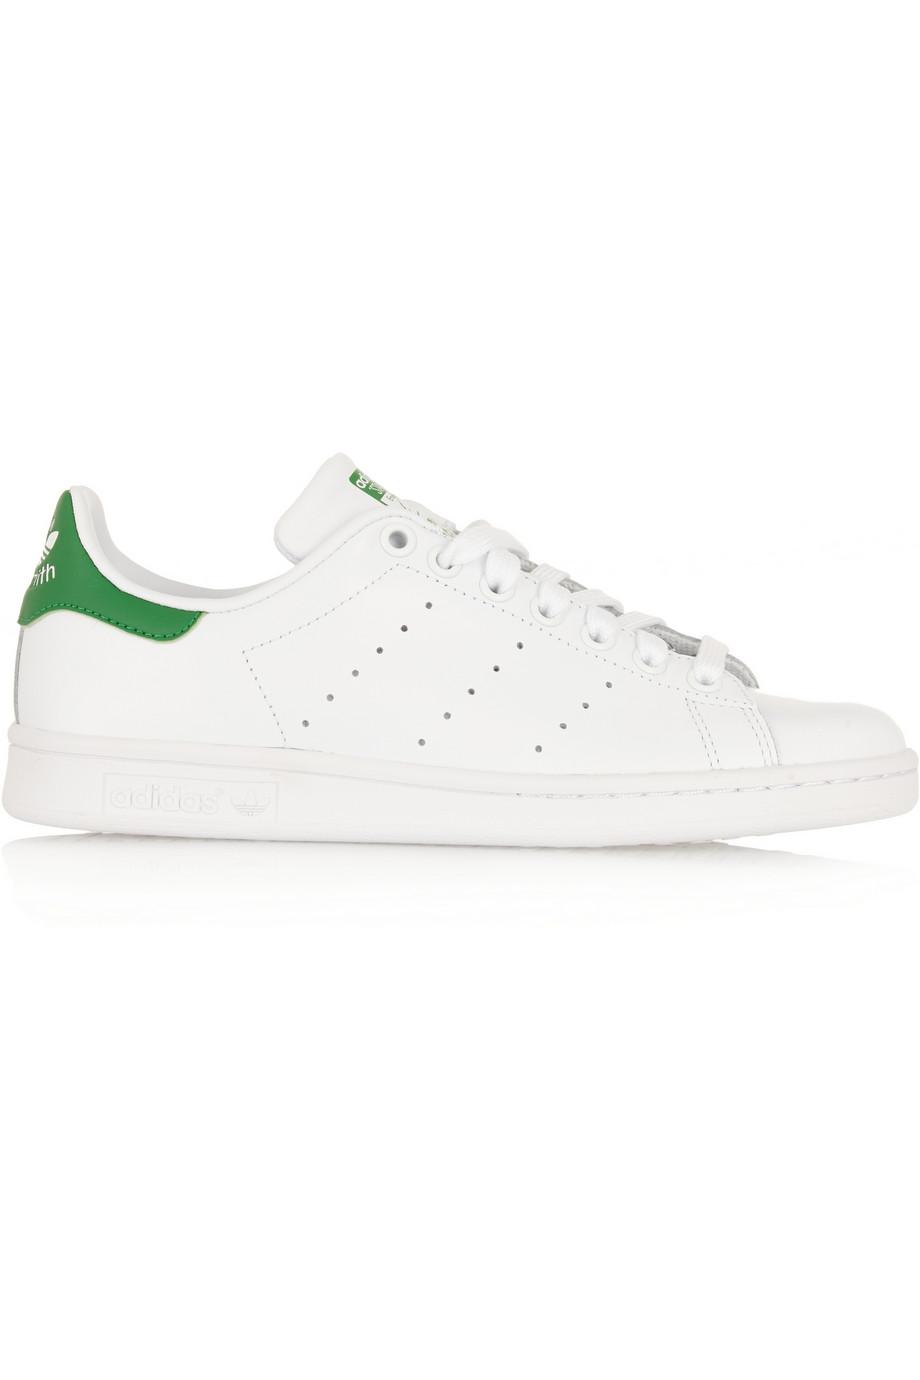 Adidas - Stan Smith(106 €)